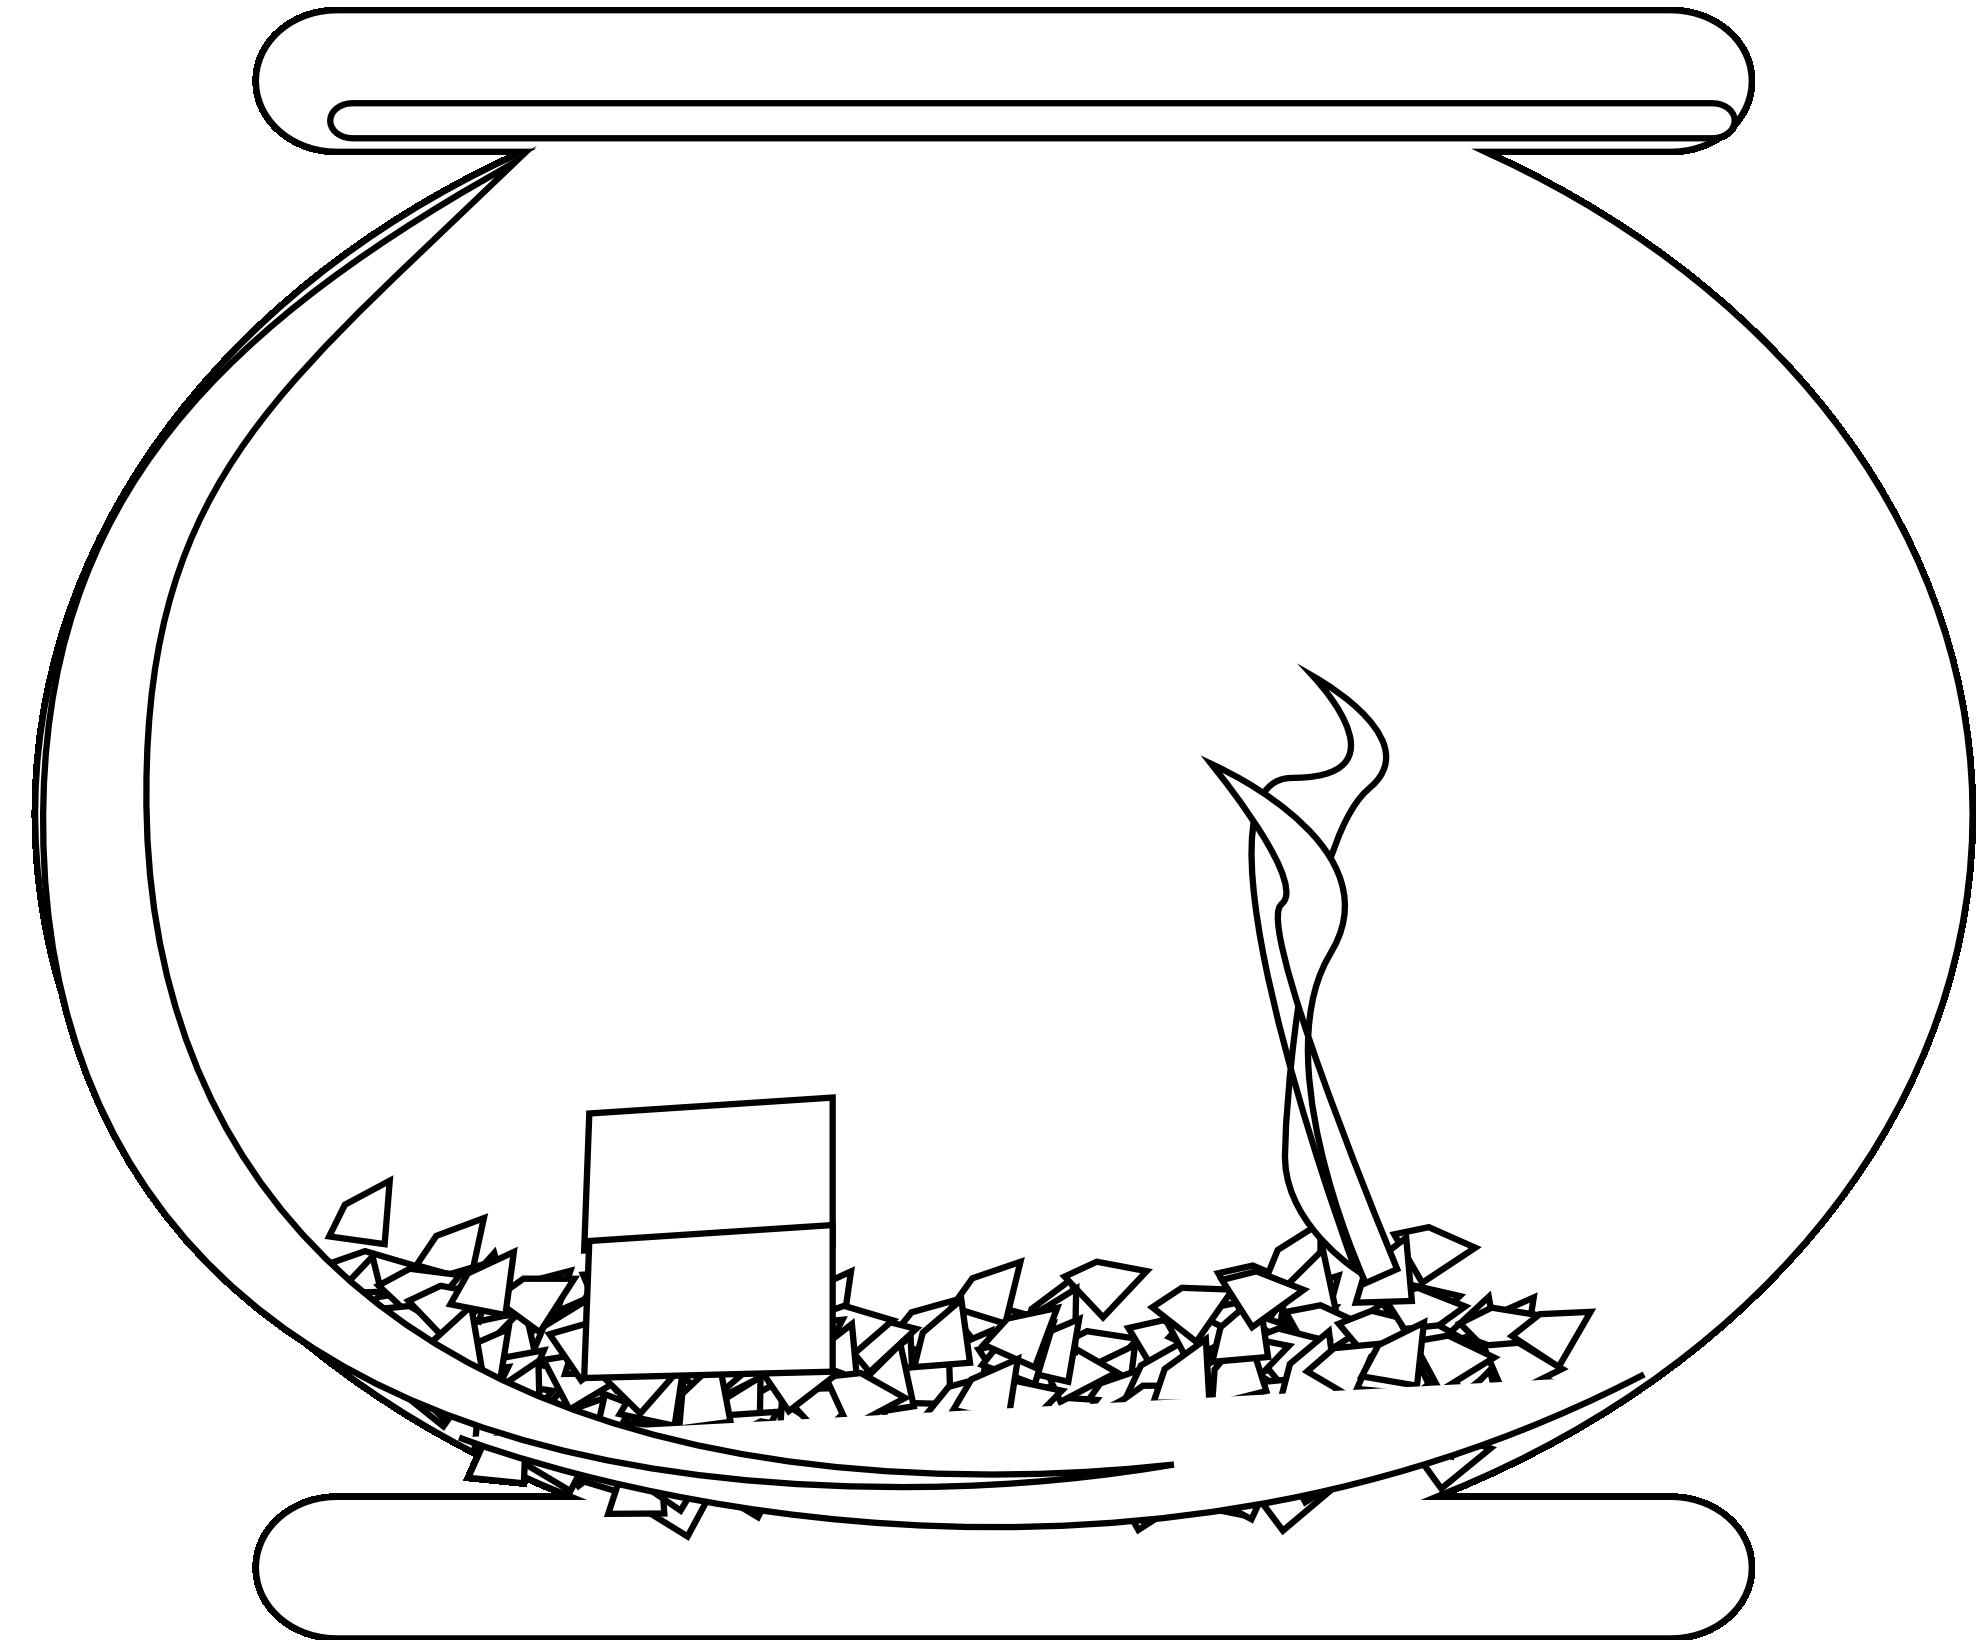 celebrate-picture-books-picture-book-review-fish-bowl-empty